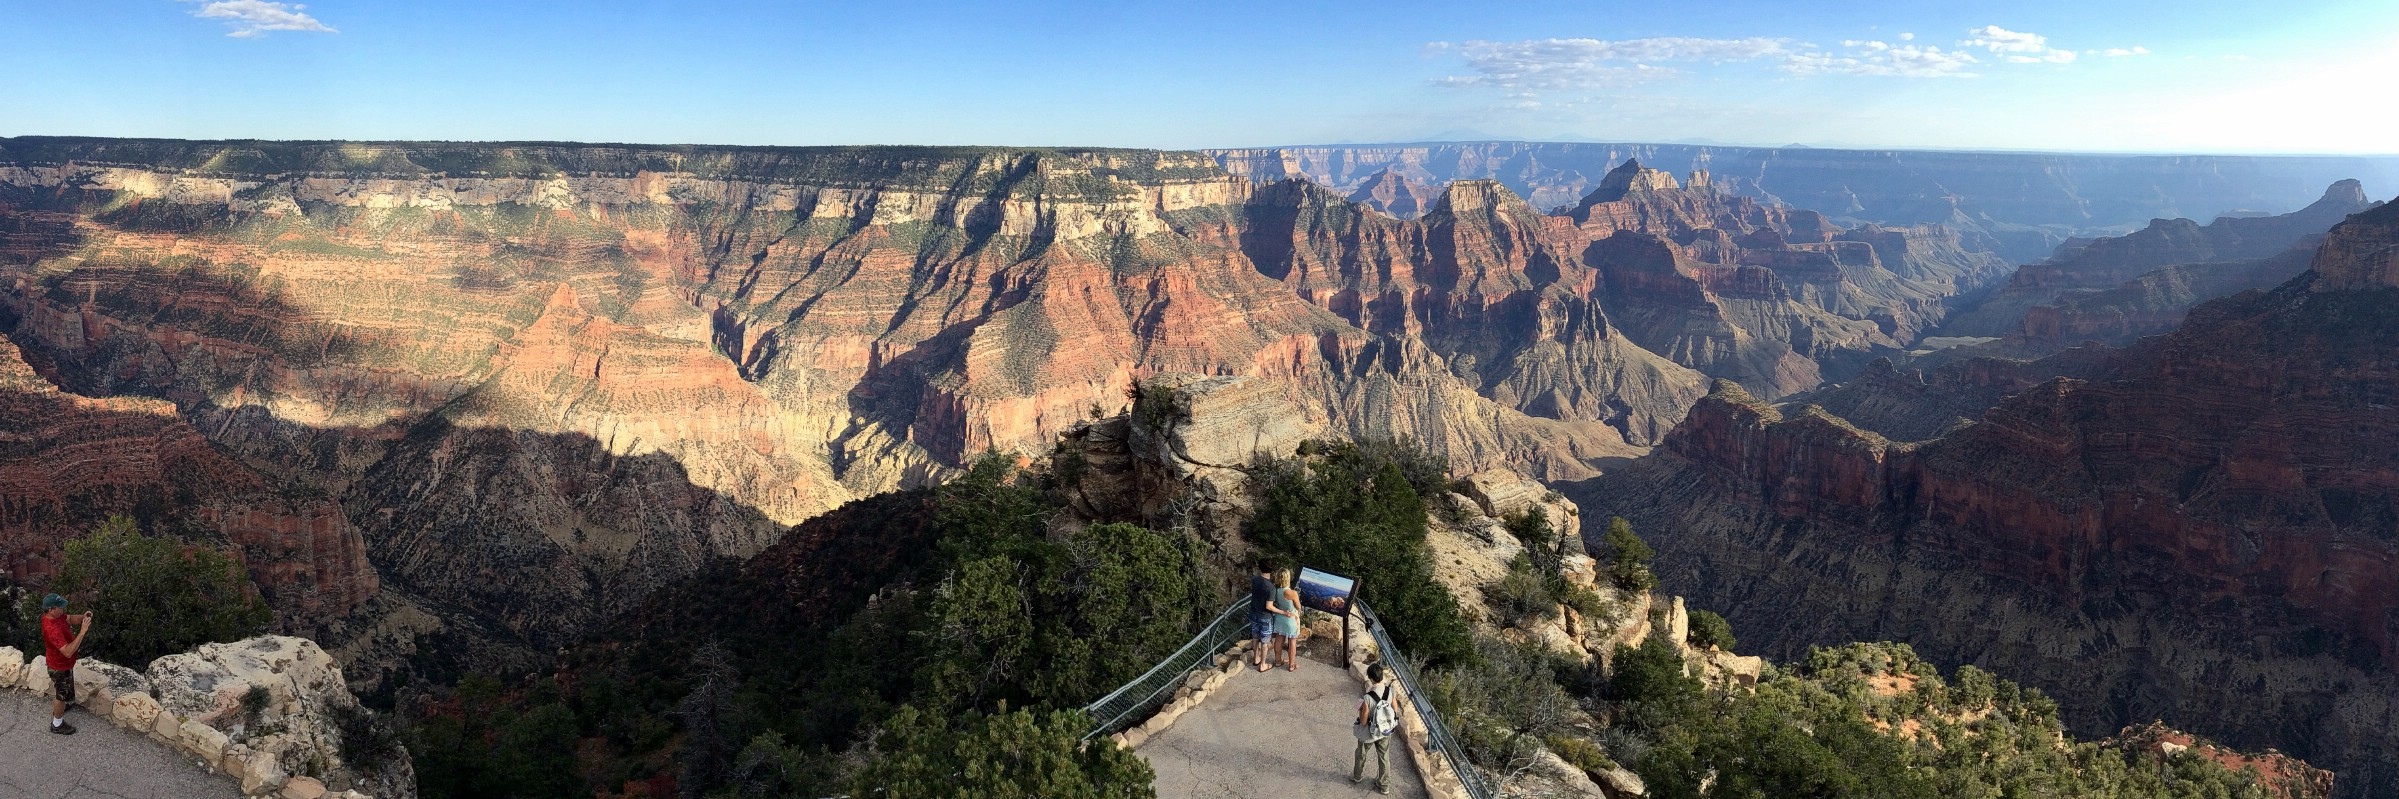 Bright Angel Point, Grand Canyon National Park North Rim, Arizona, USA. September 9, 2016.